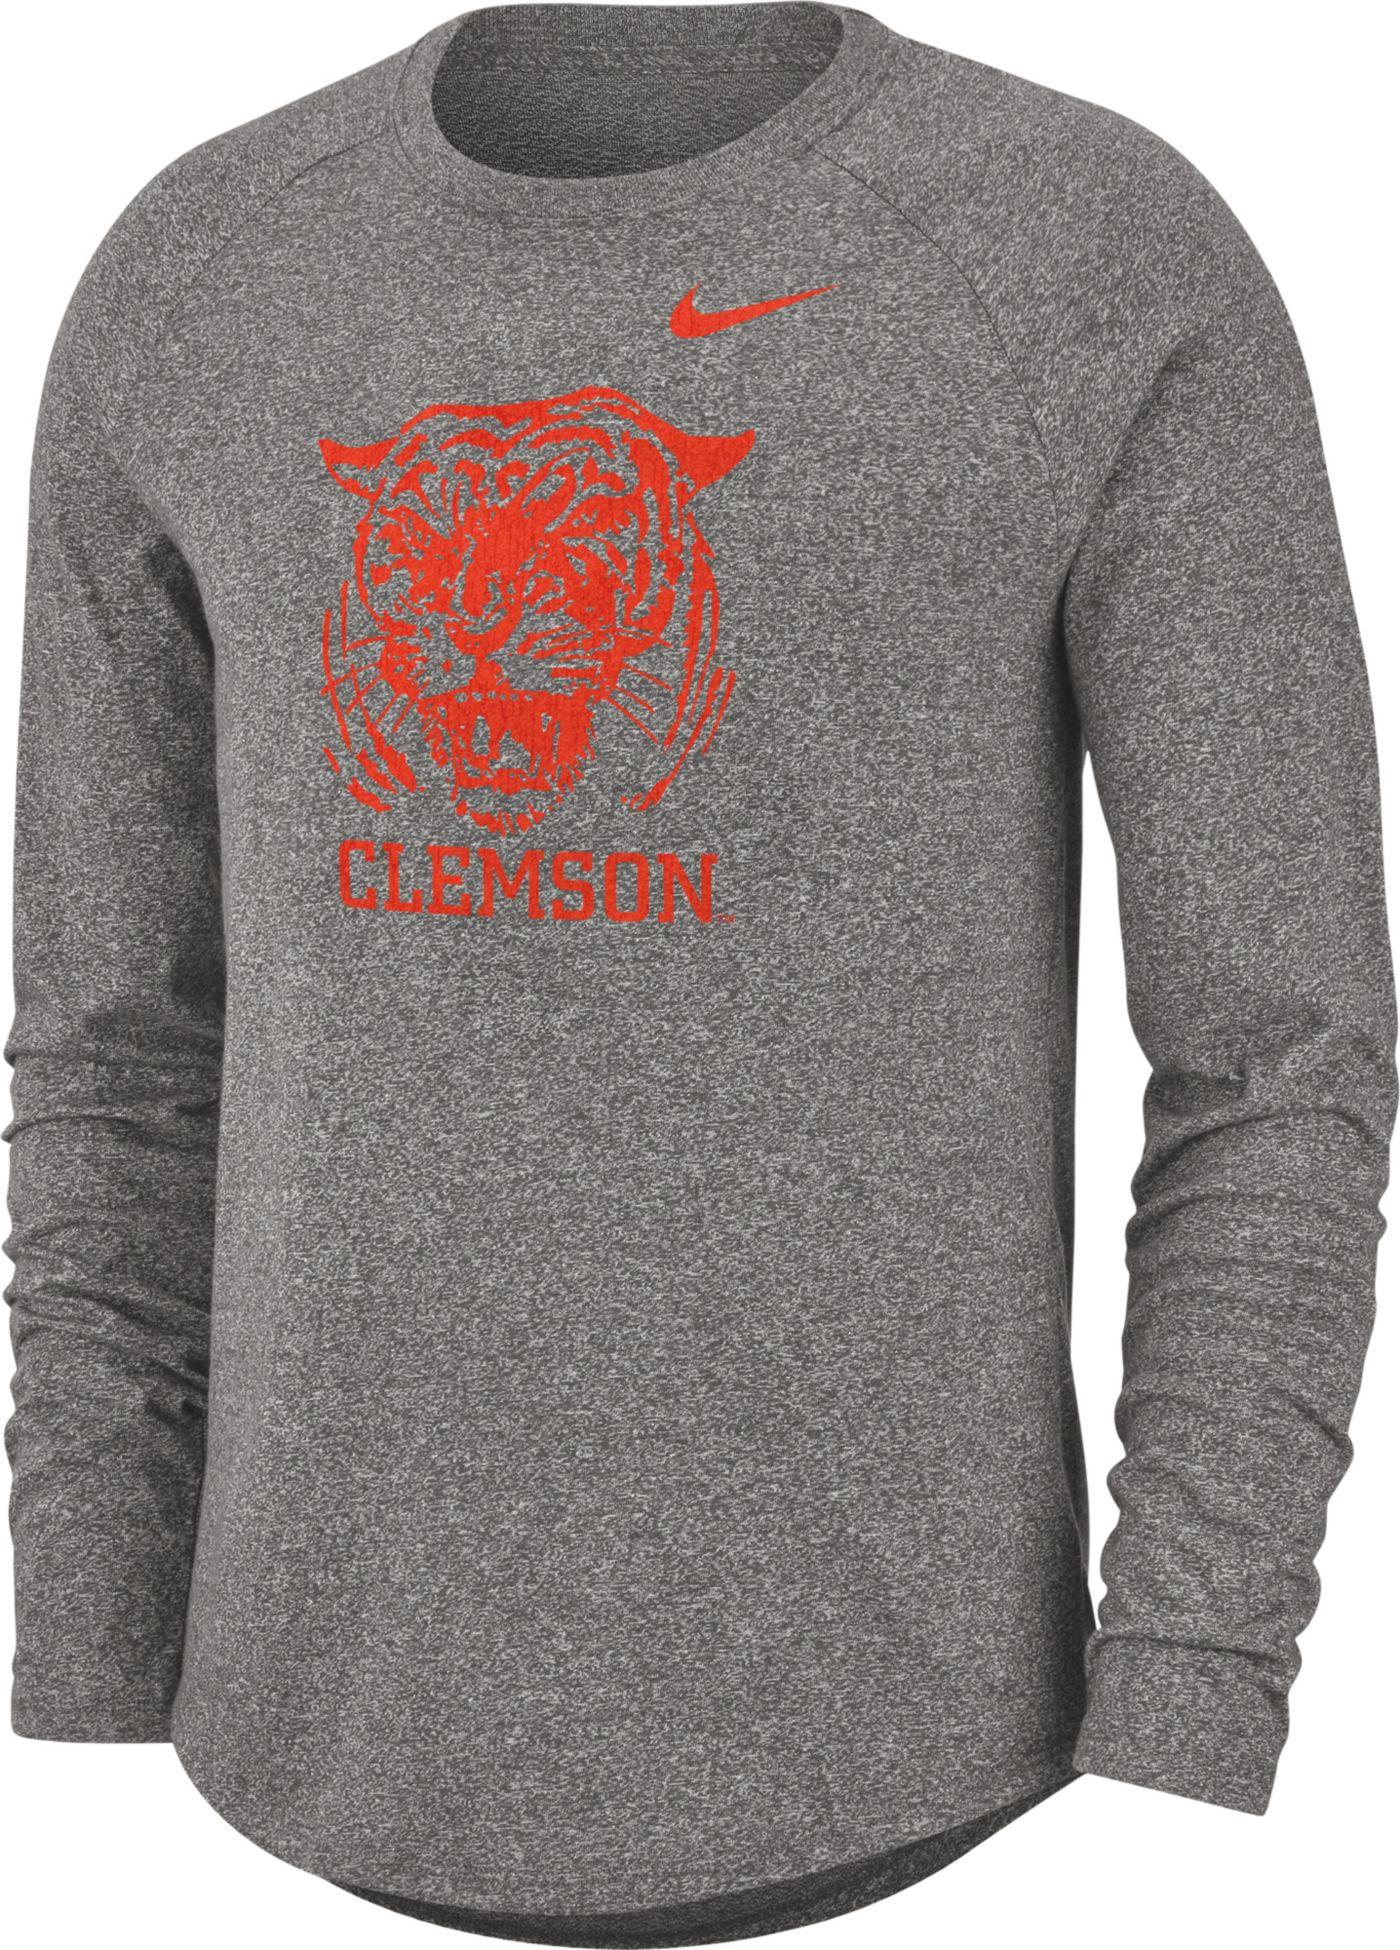 Nike Men's Clemson Tigers Grey Marled Raglan Long Sleeve T-Shirt